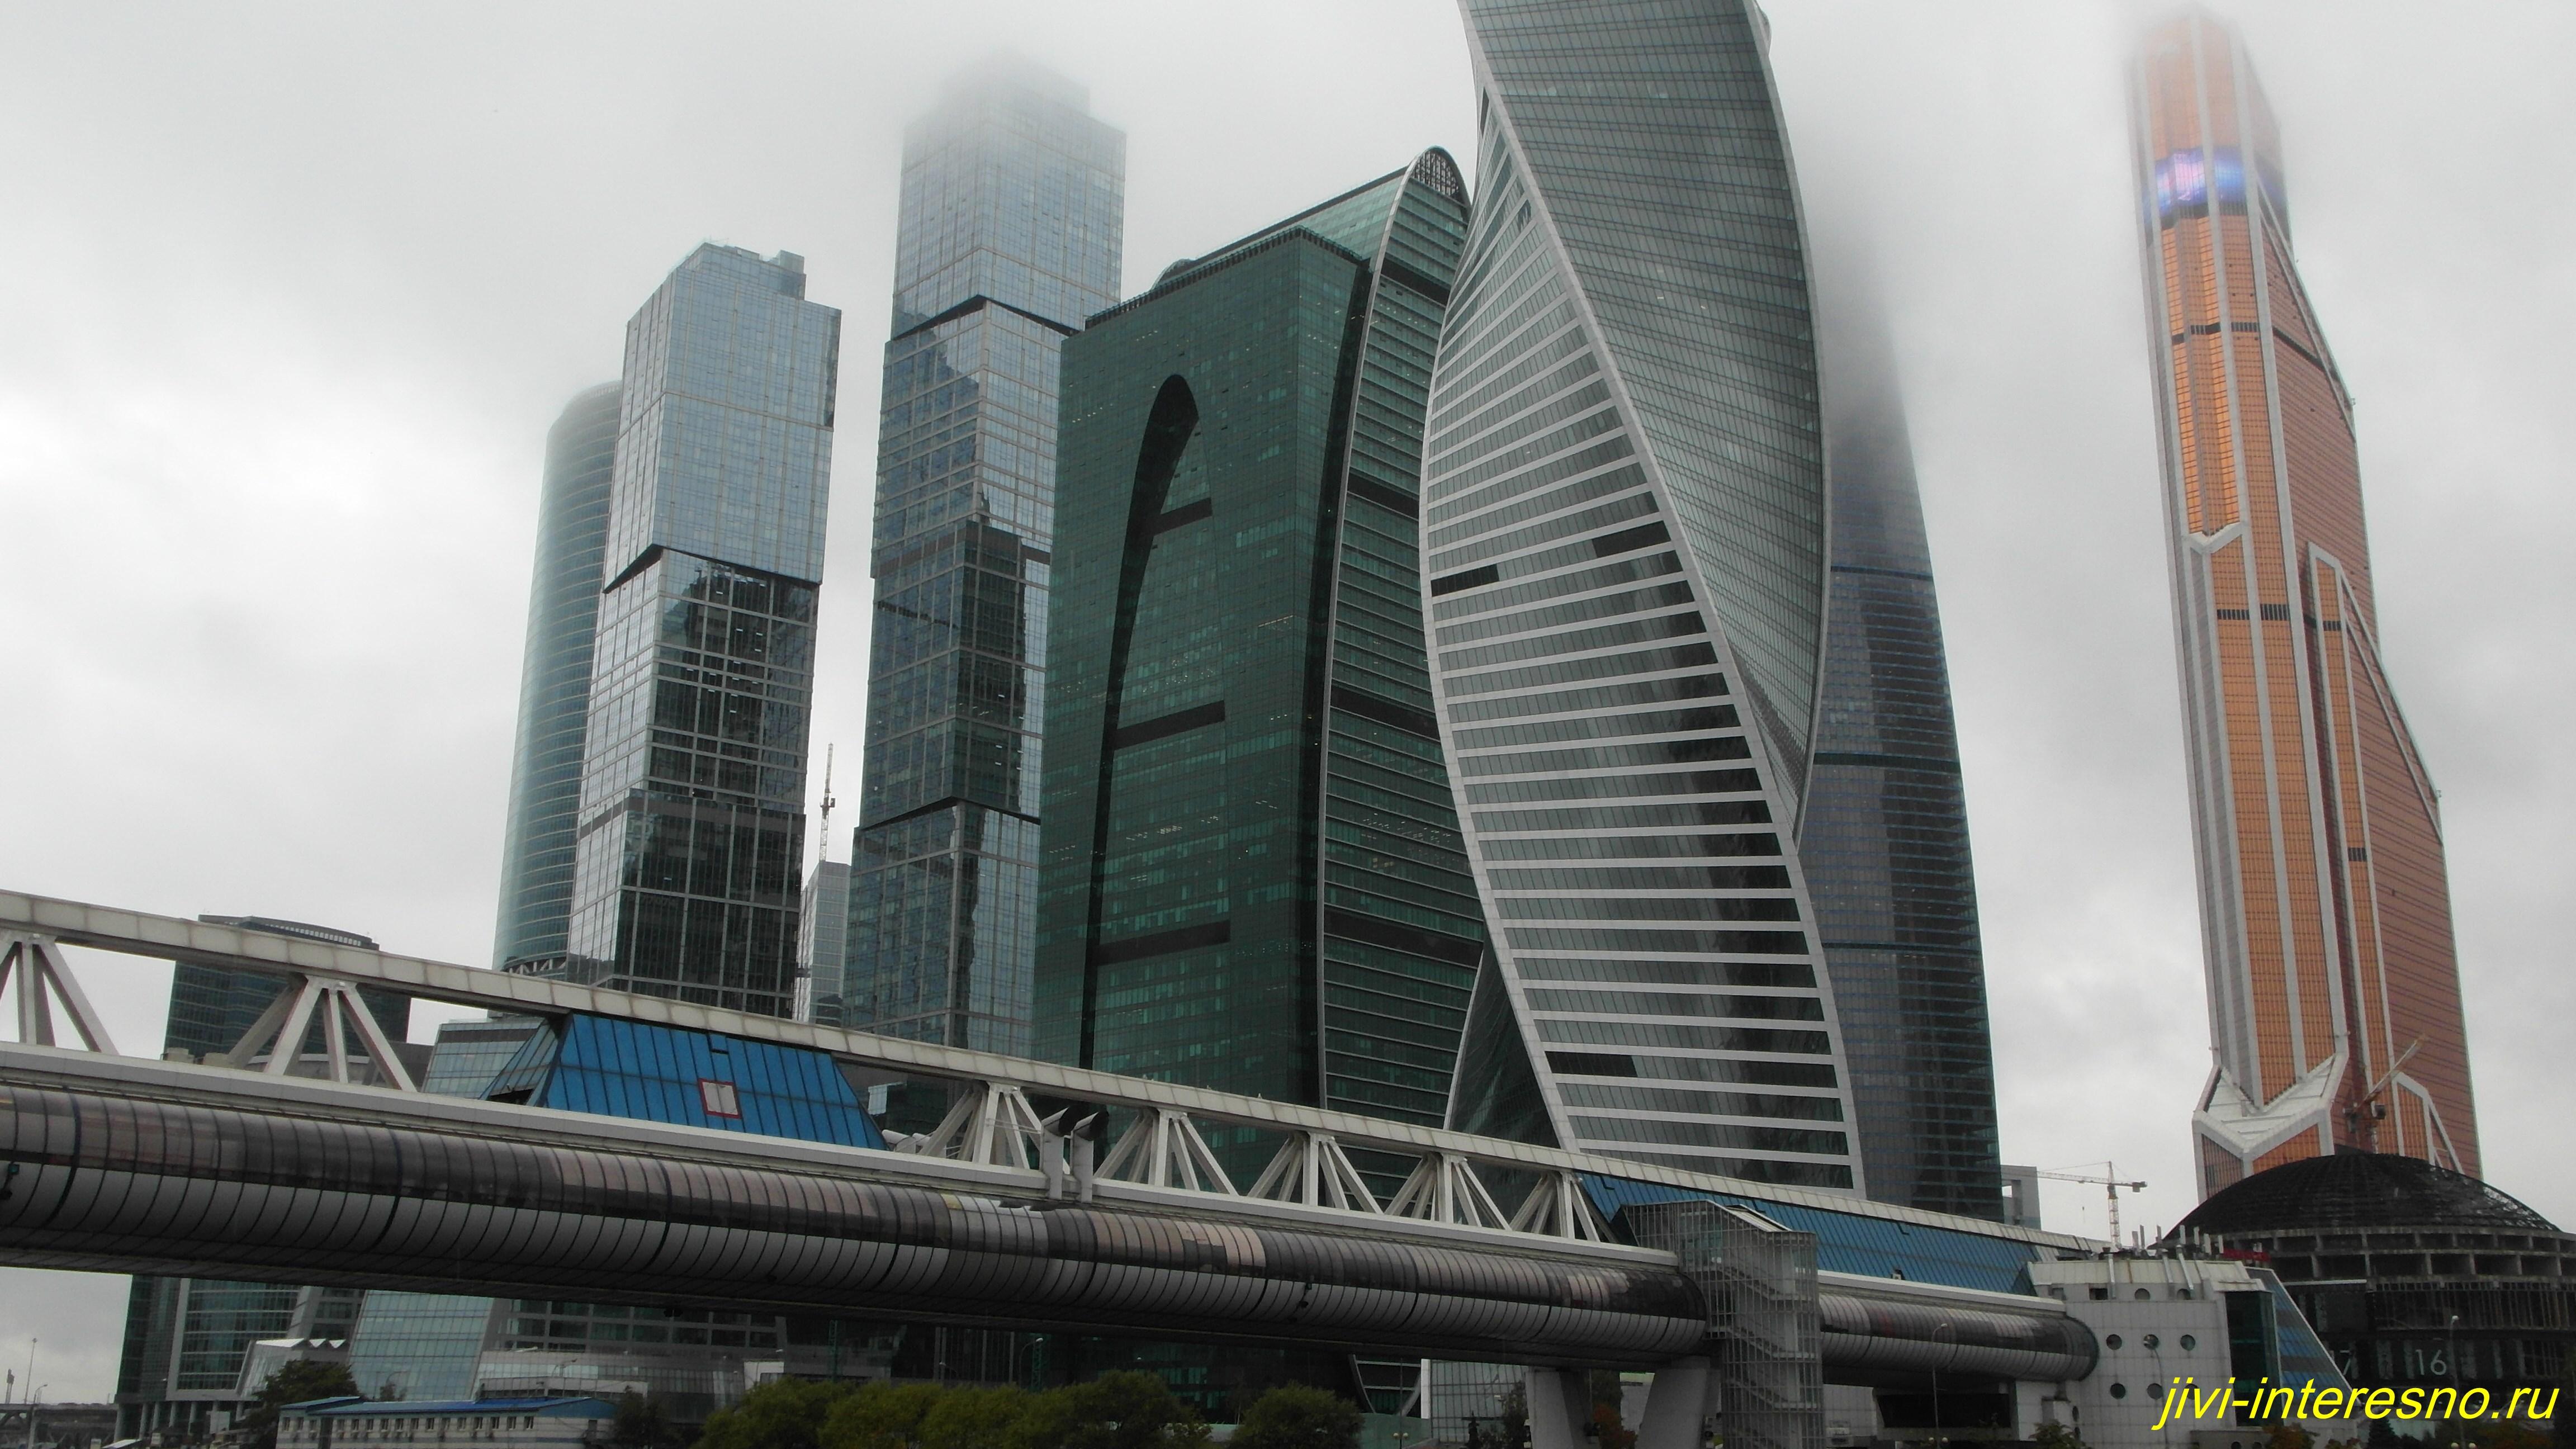 Осенняя Москва, Мост Багратион, Москва-Сити